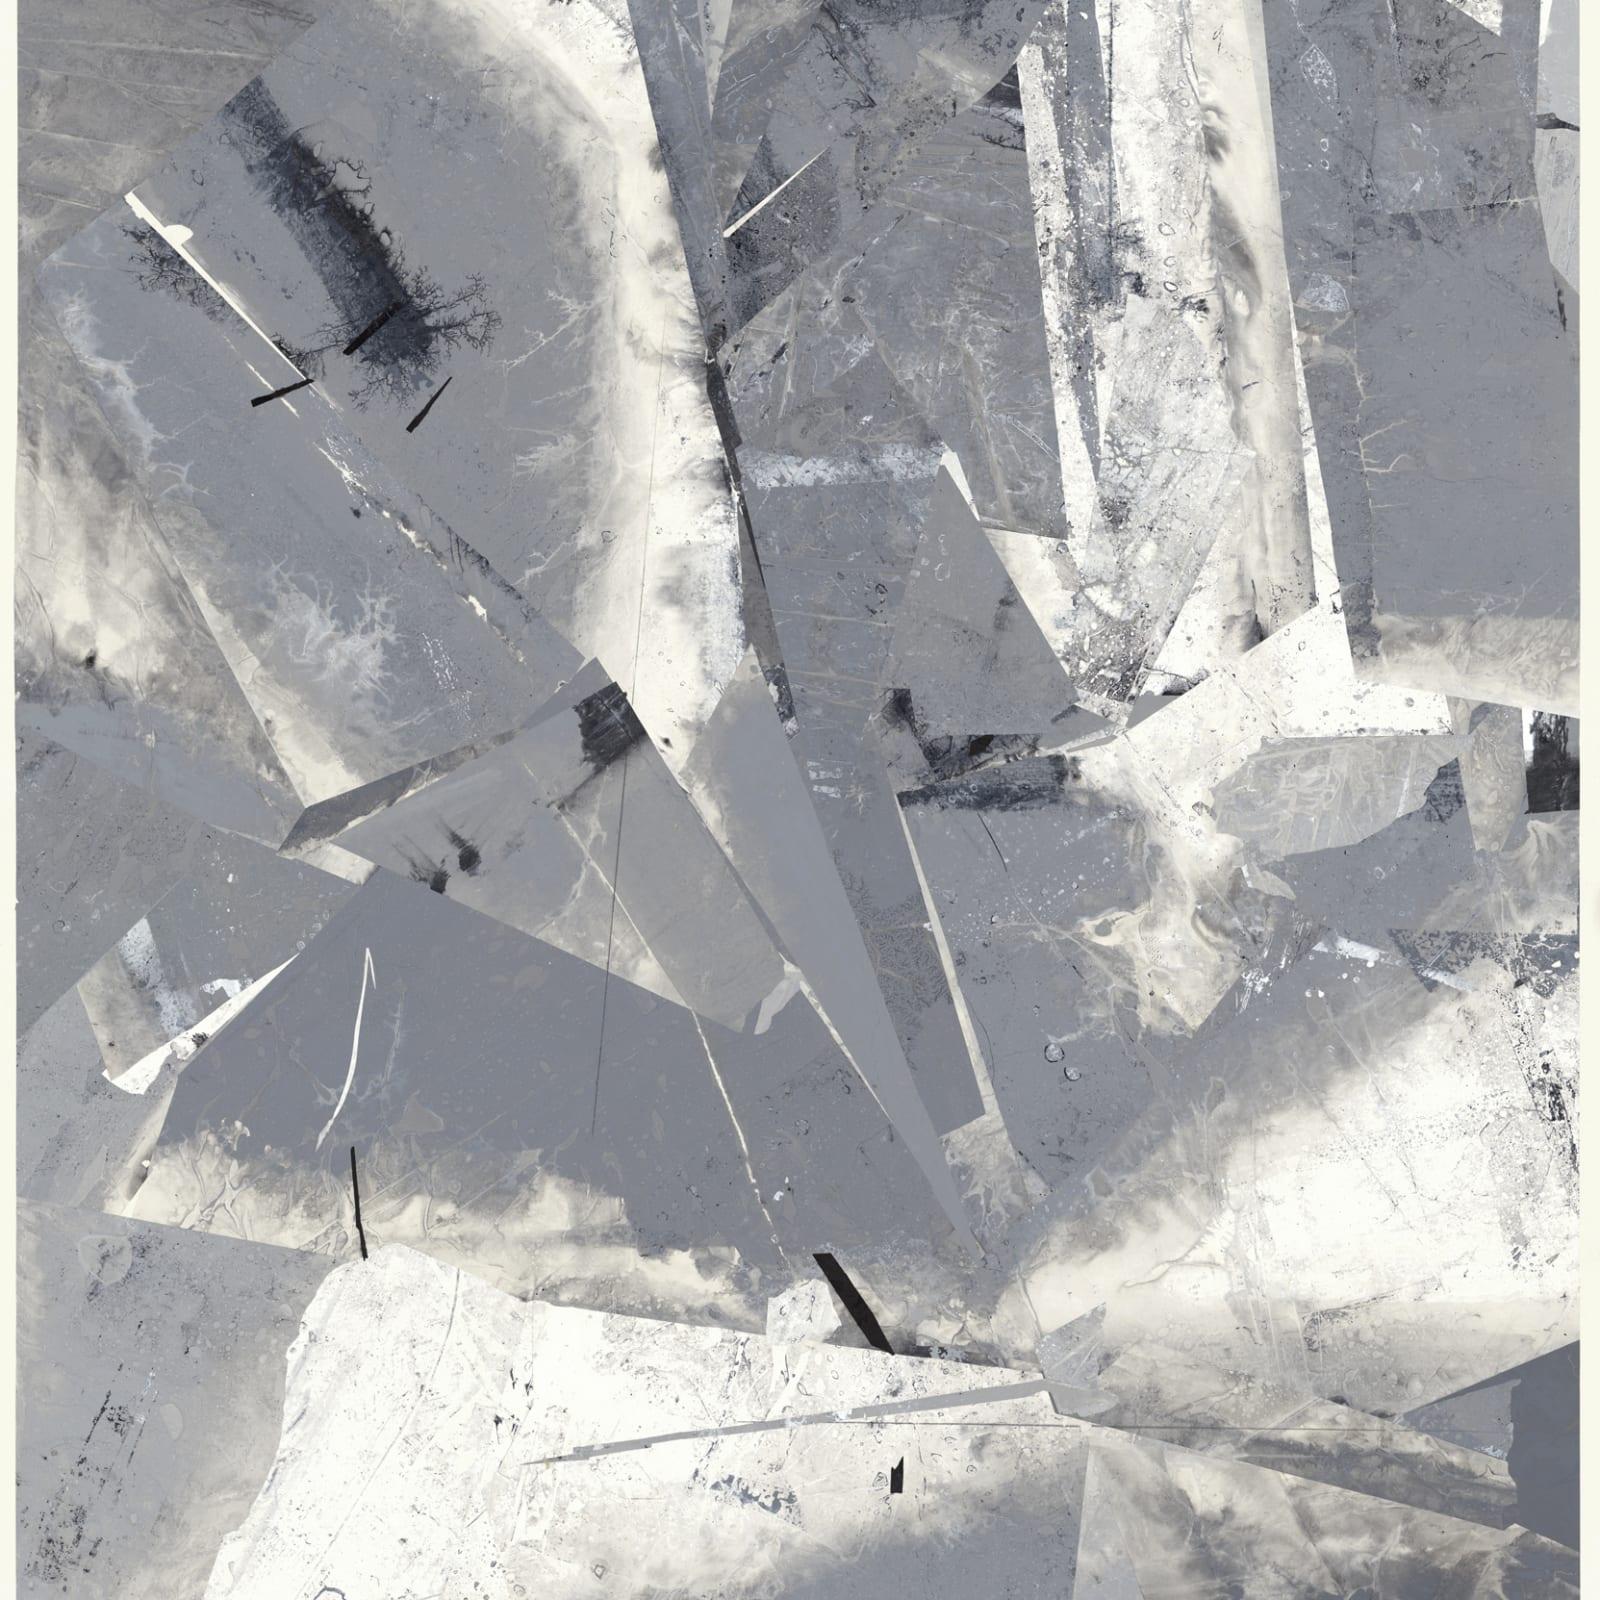 Zheng Chongbin 郑重宾, Revealing Shadows from the Formless 无体显影, 2019